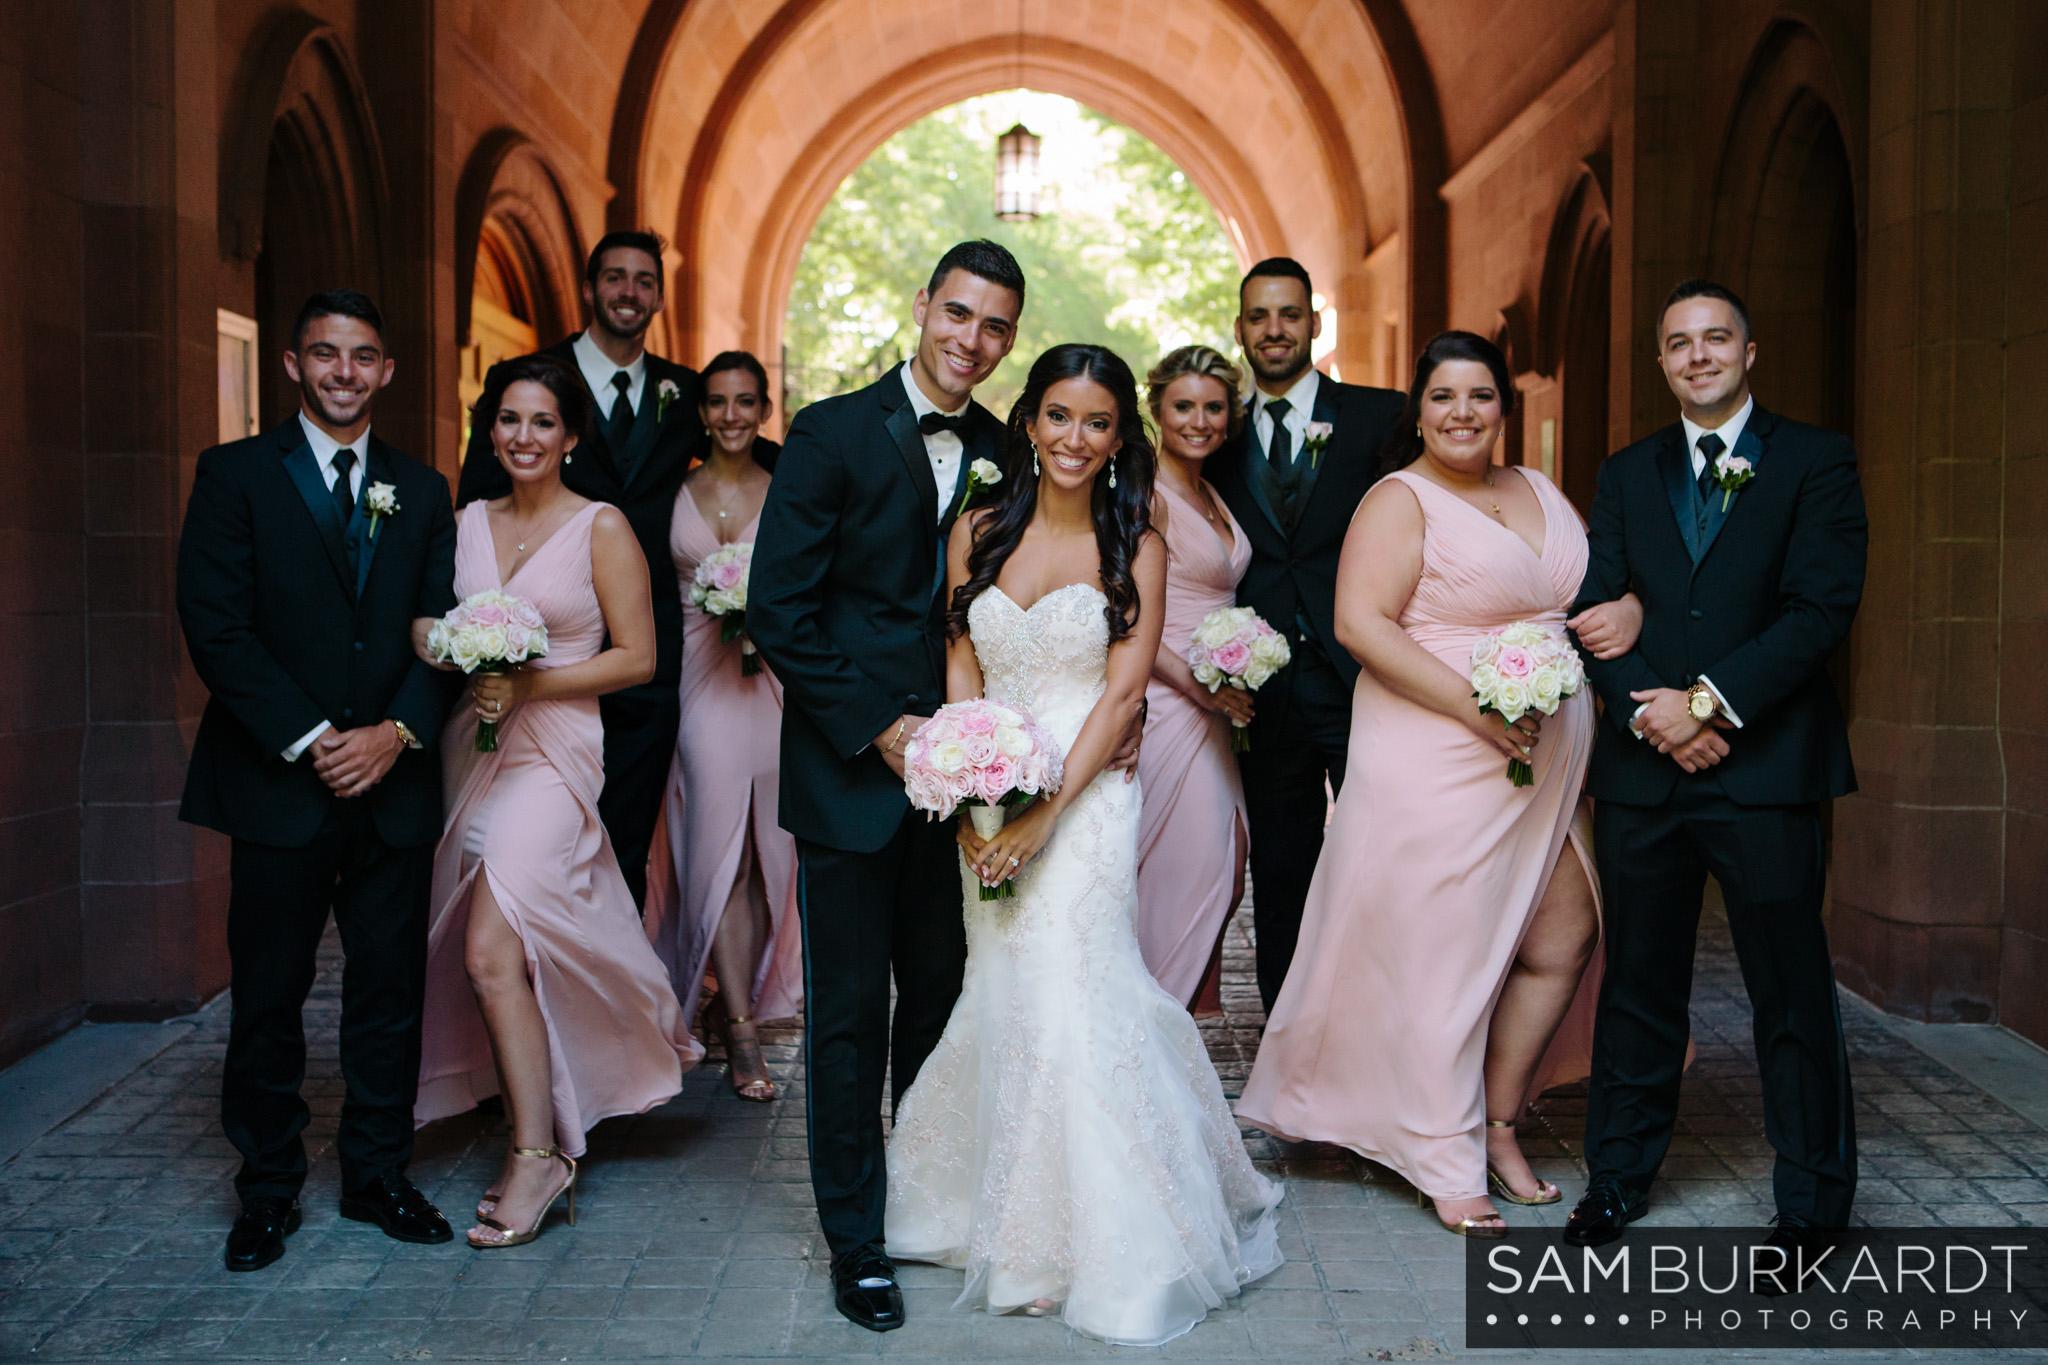 samburkardt_yale_wedding_CT__0001.jpg